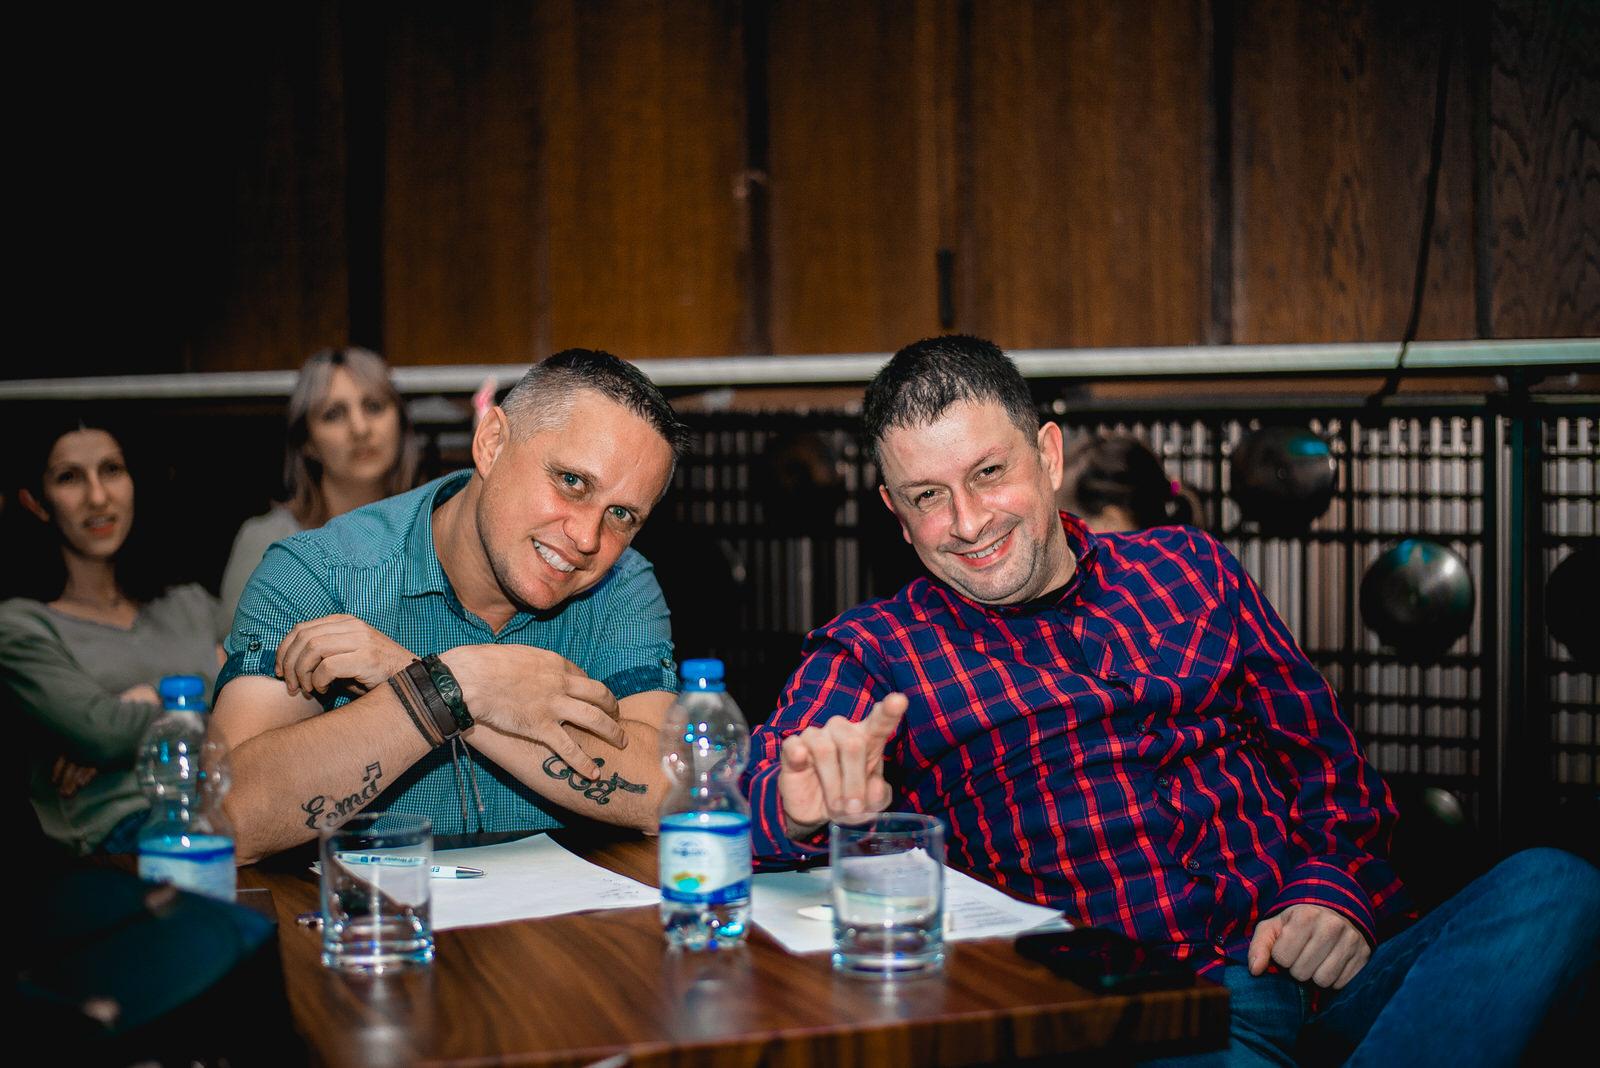 likaclub_gospić_prvi-pljesak-2018-85